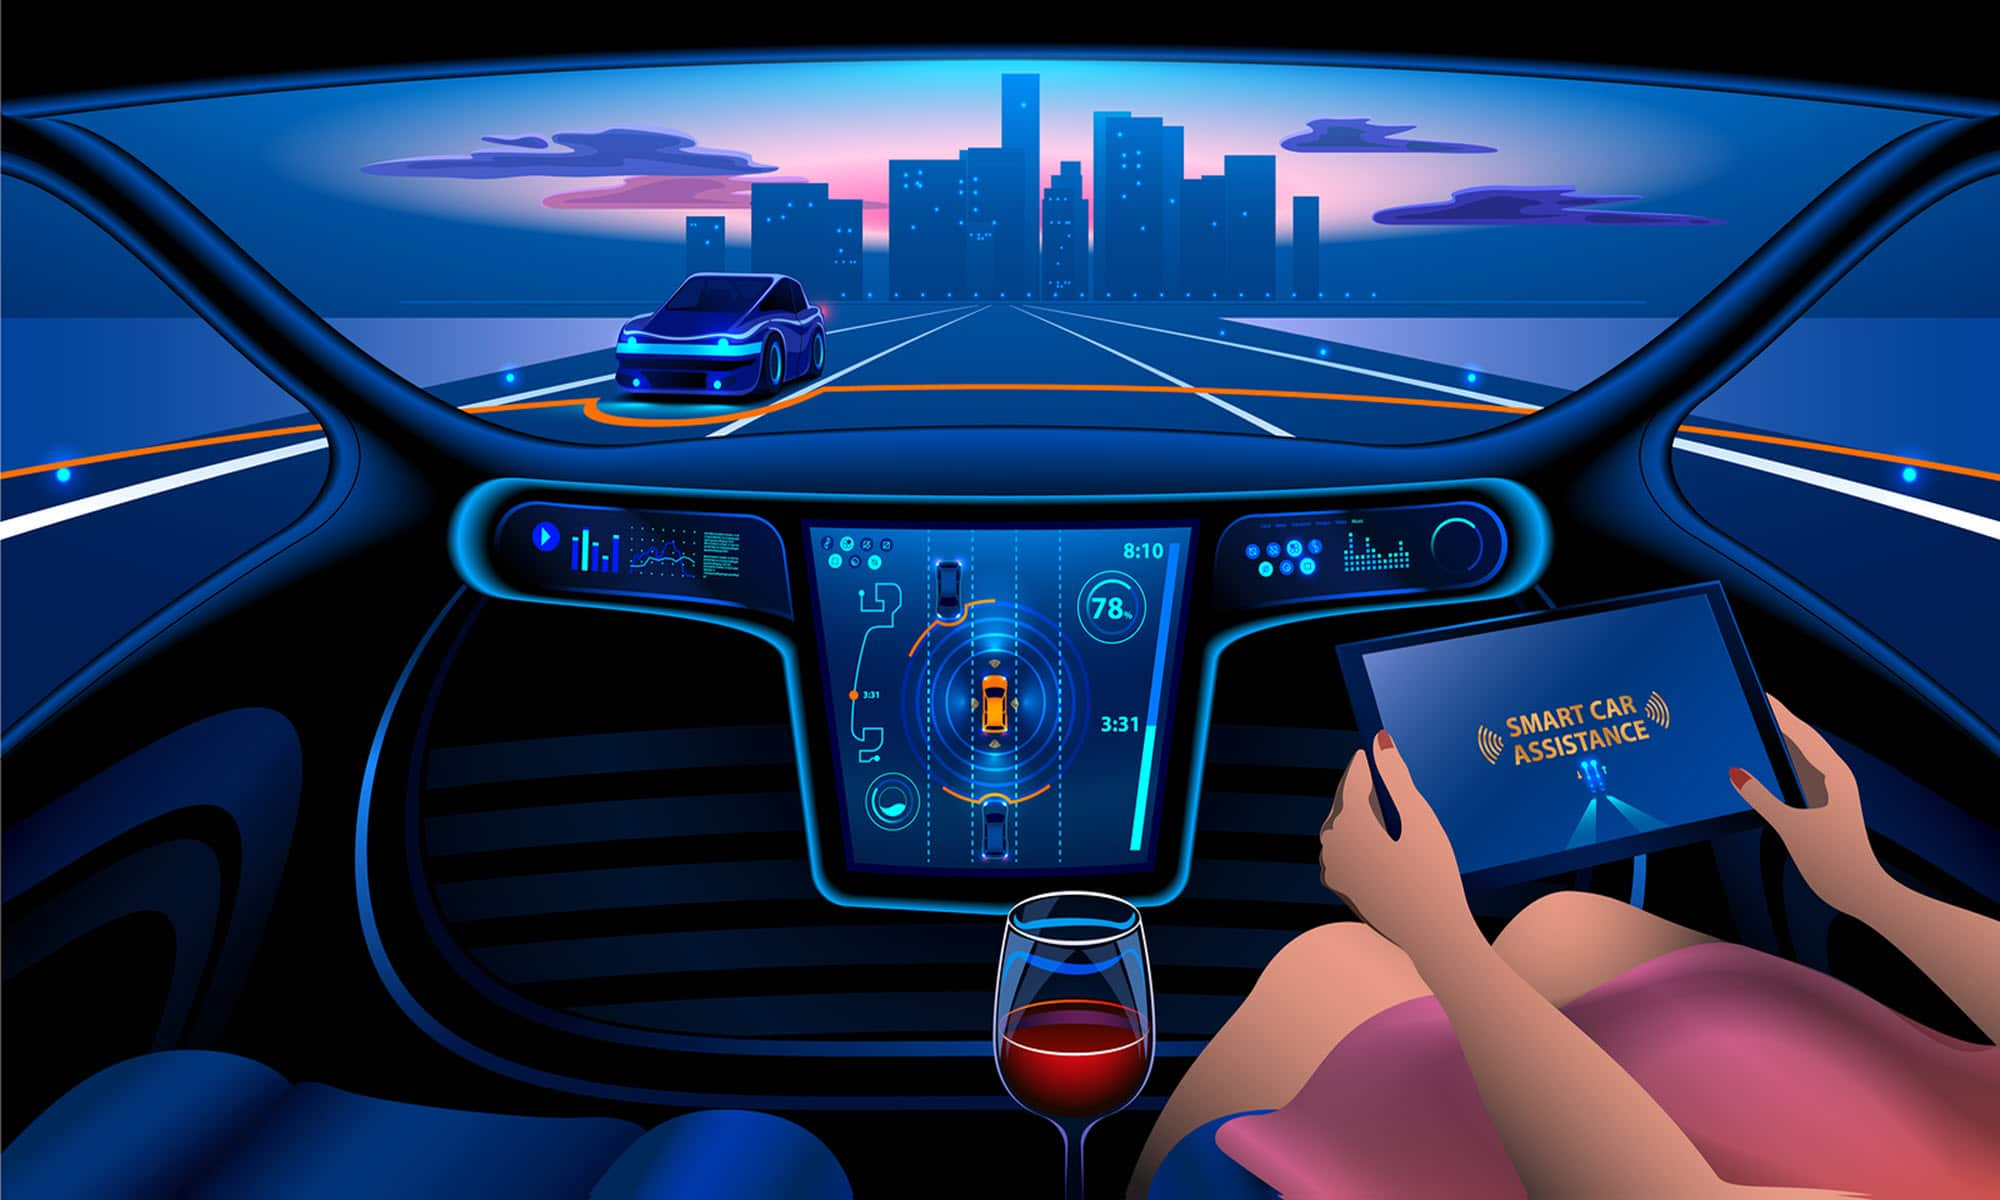 New Autonomous Vehicle Platform Connects Road Authorities with Vehicle Operators